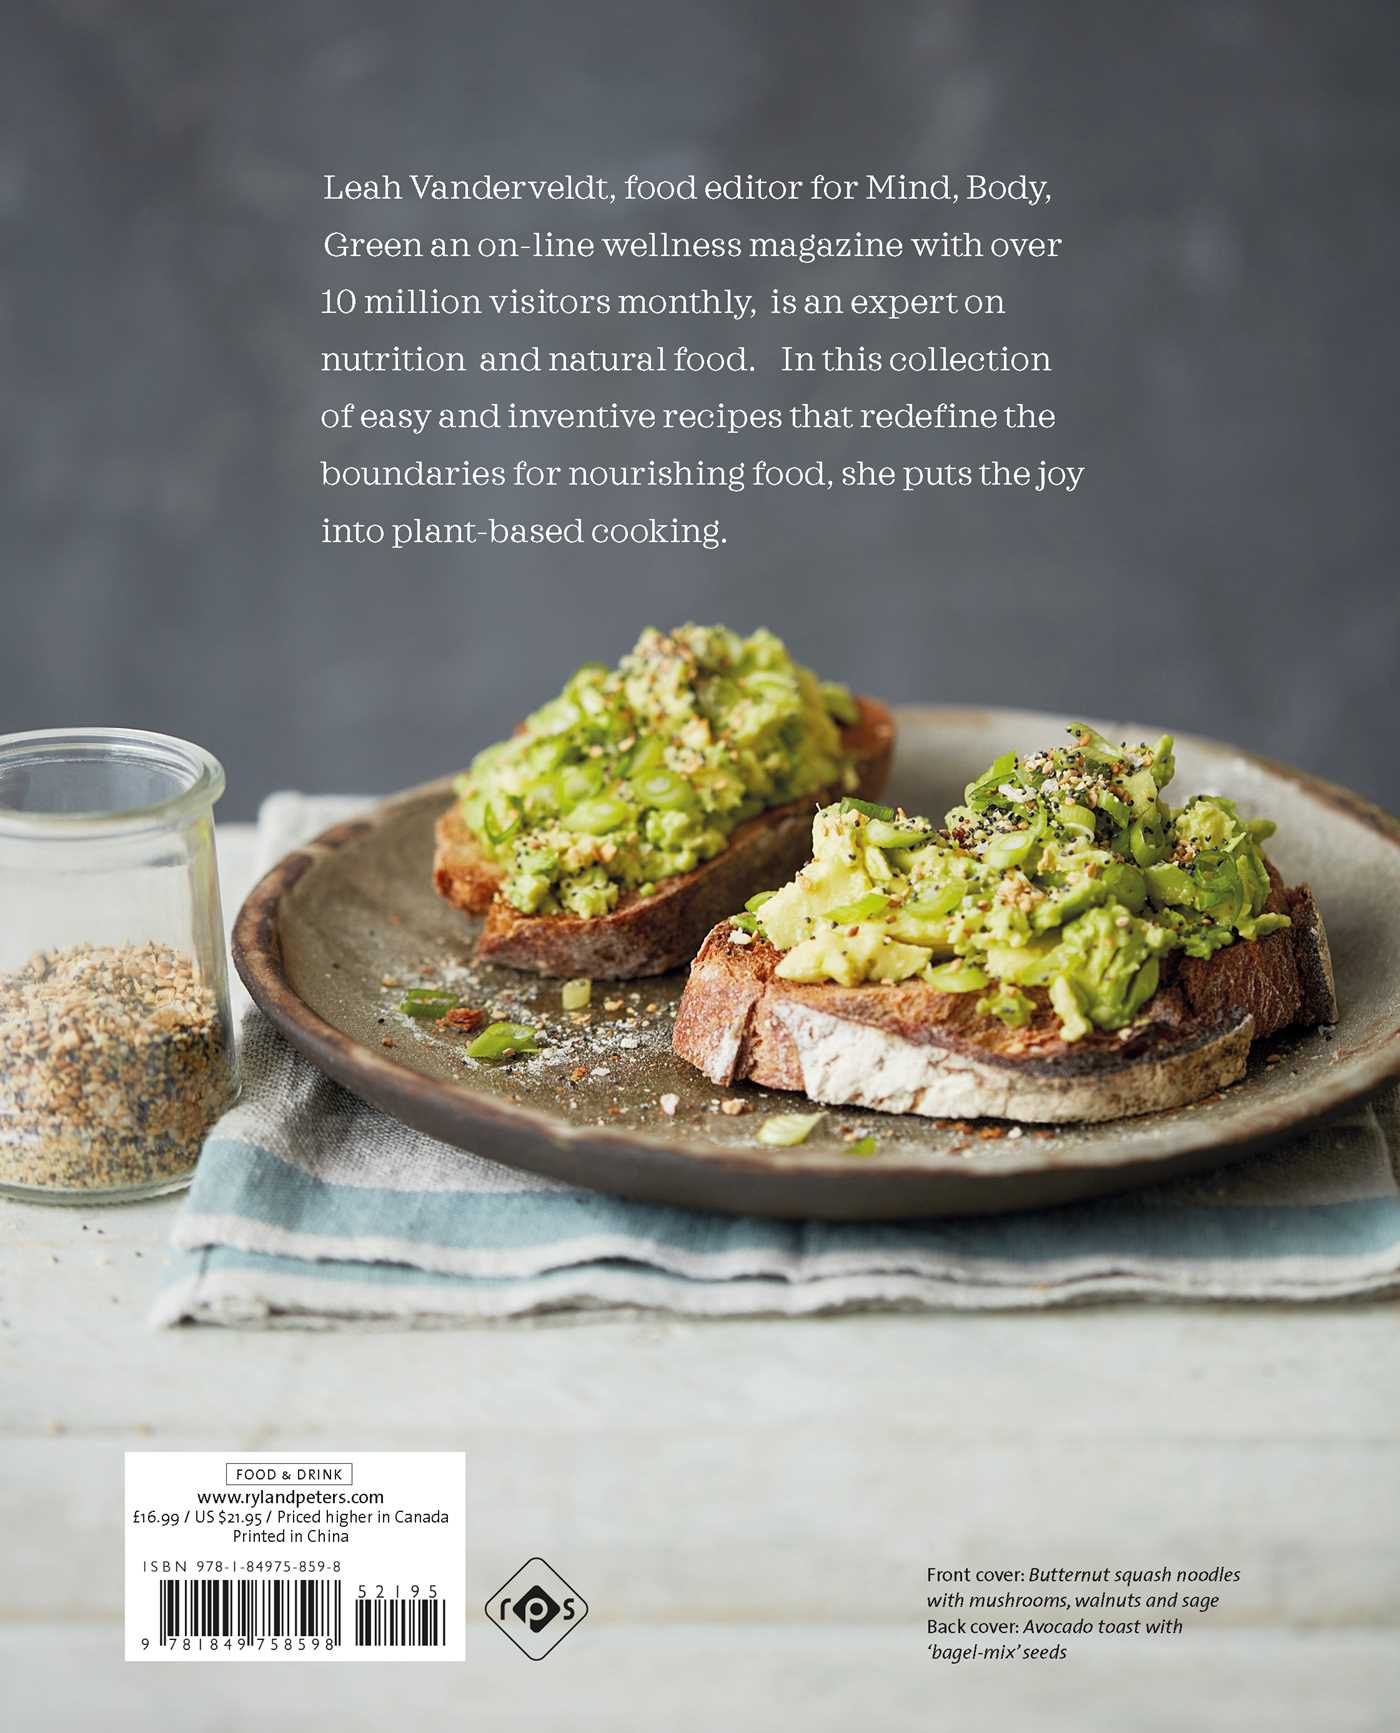 The new nourishing book by leah vanderveldt official publisher the new nourishing 9781849758598 hr the new nourishing 9781849758598 hr back forumfinder Choice Image